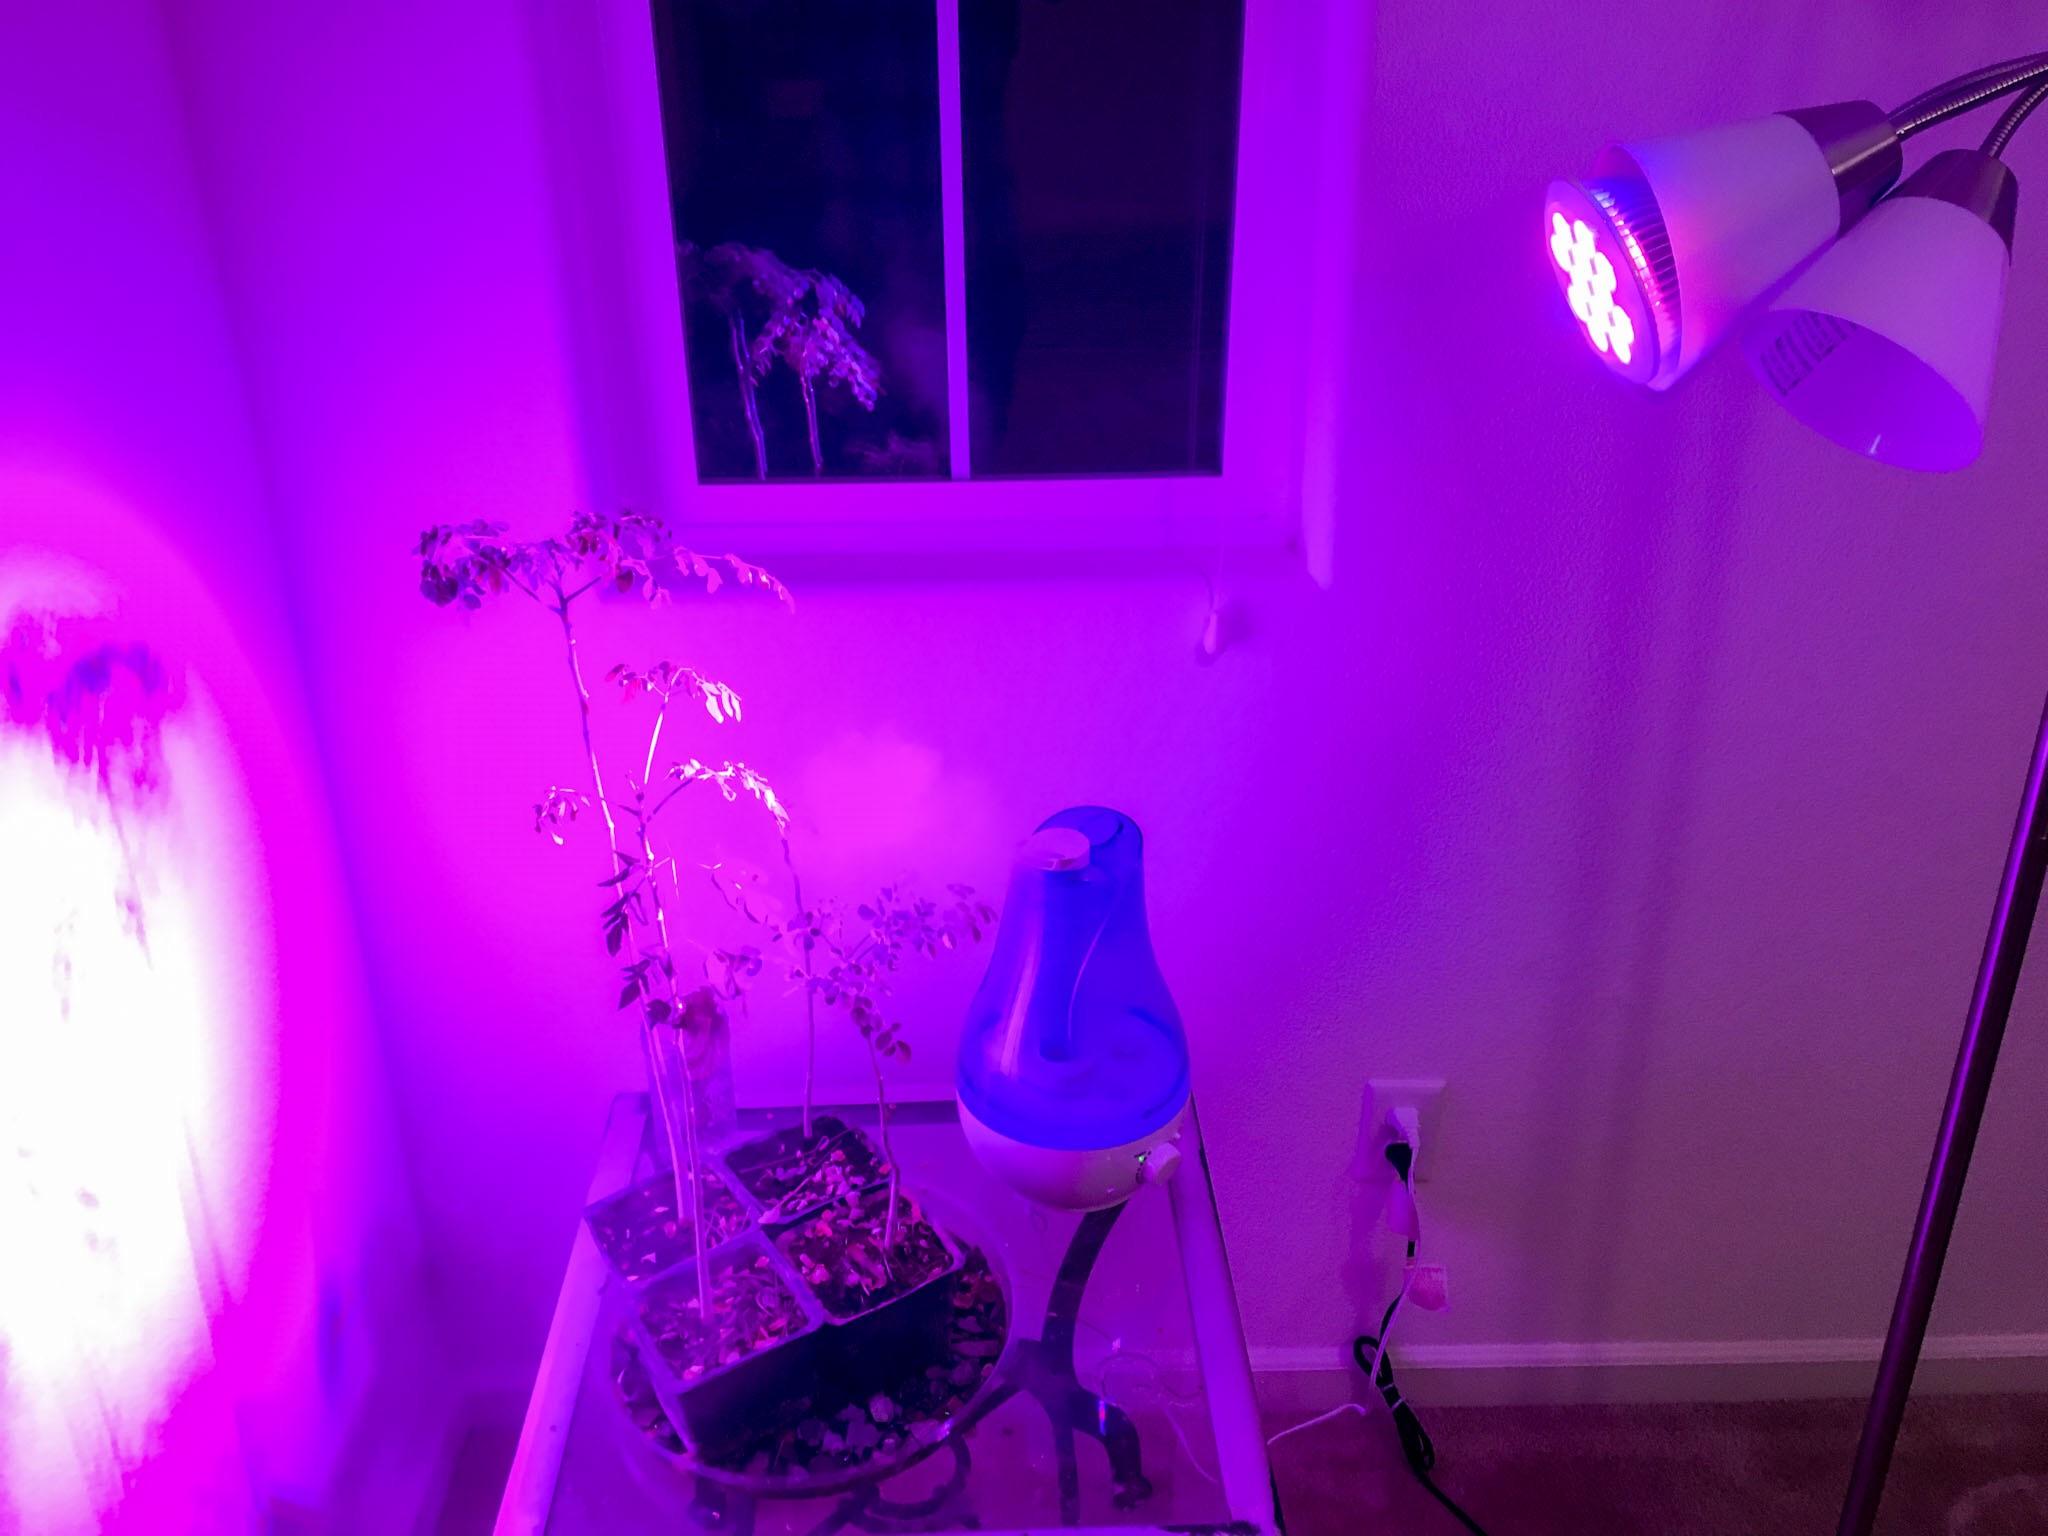 Indoor Lighting for Moringa Trees